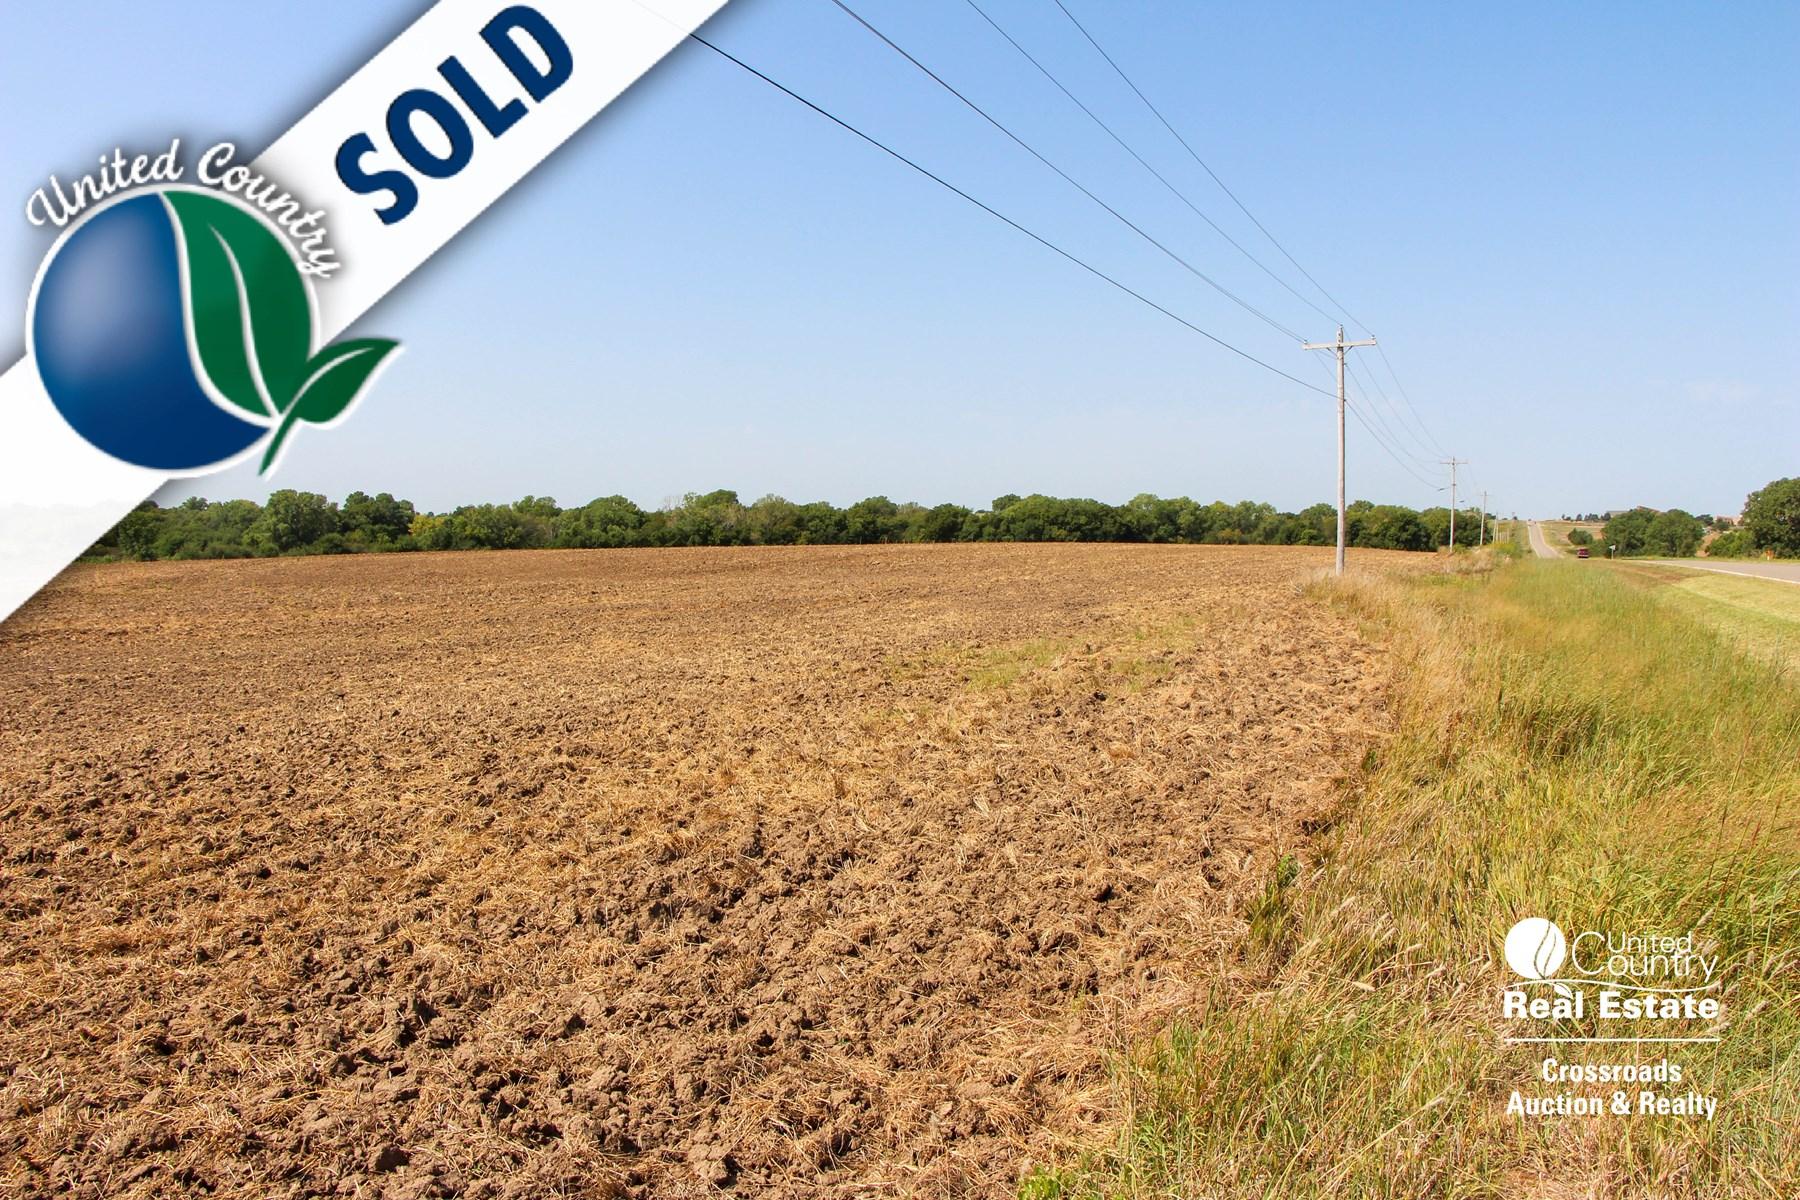 Salina Kansas Development Land For Sale in Saline County